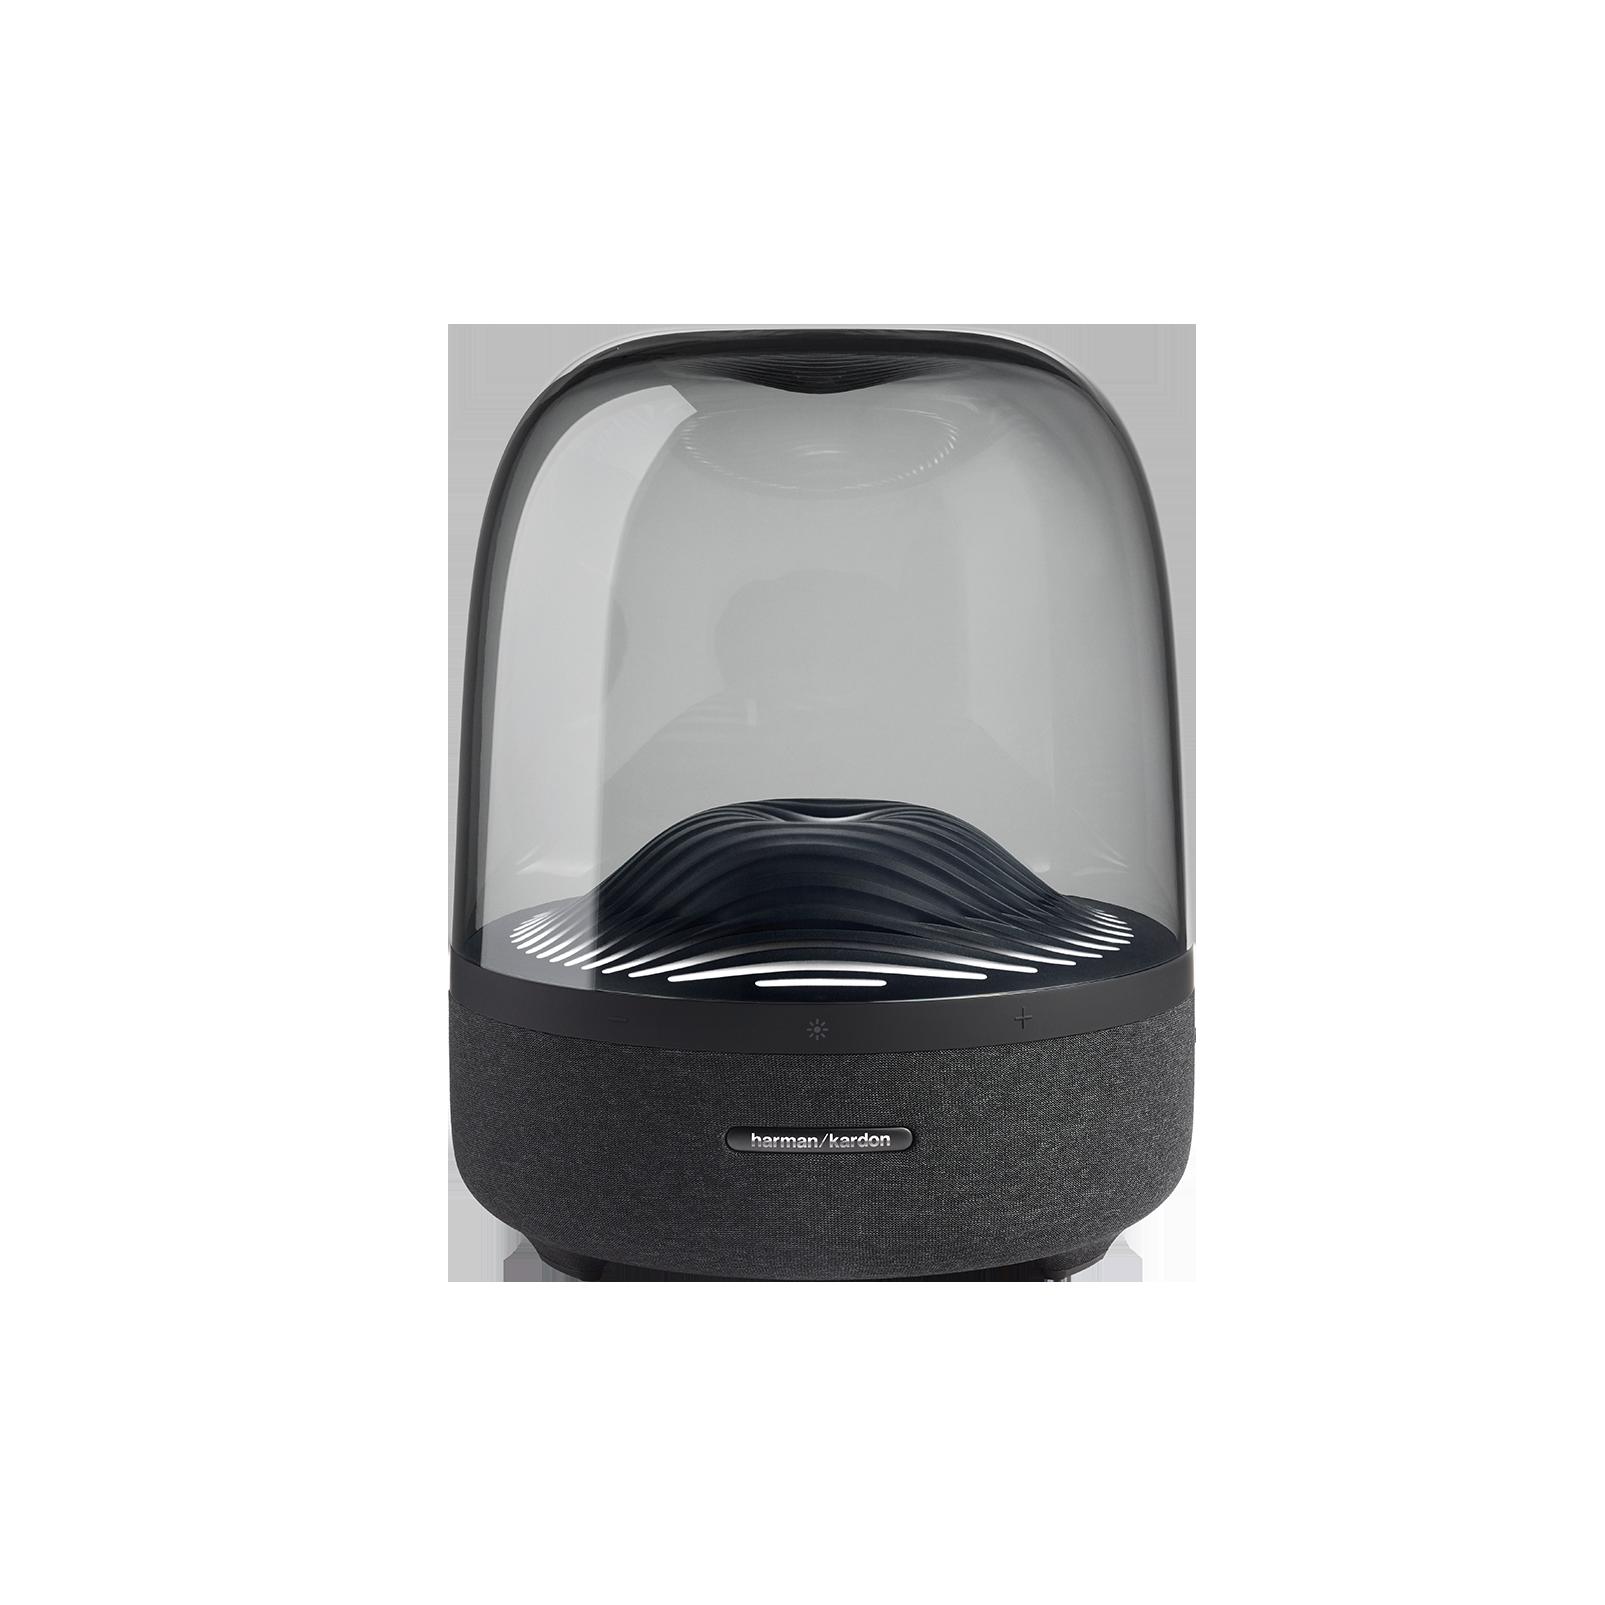 Harman Kardon Bluetooth Speaker Aura Studio 3 with Bluetooth 4.2 Connection 360-Degree Sound Ambient Light